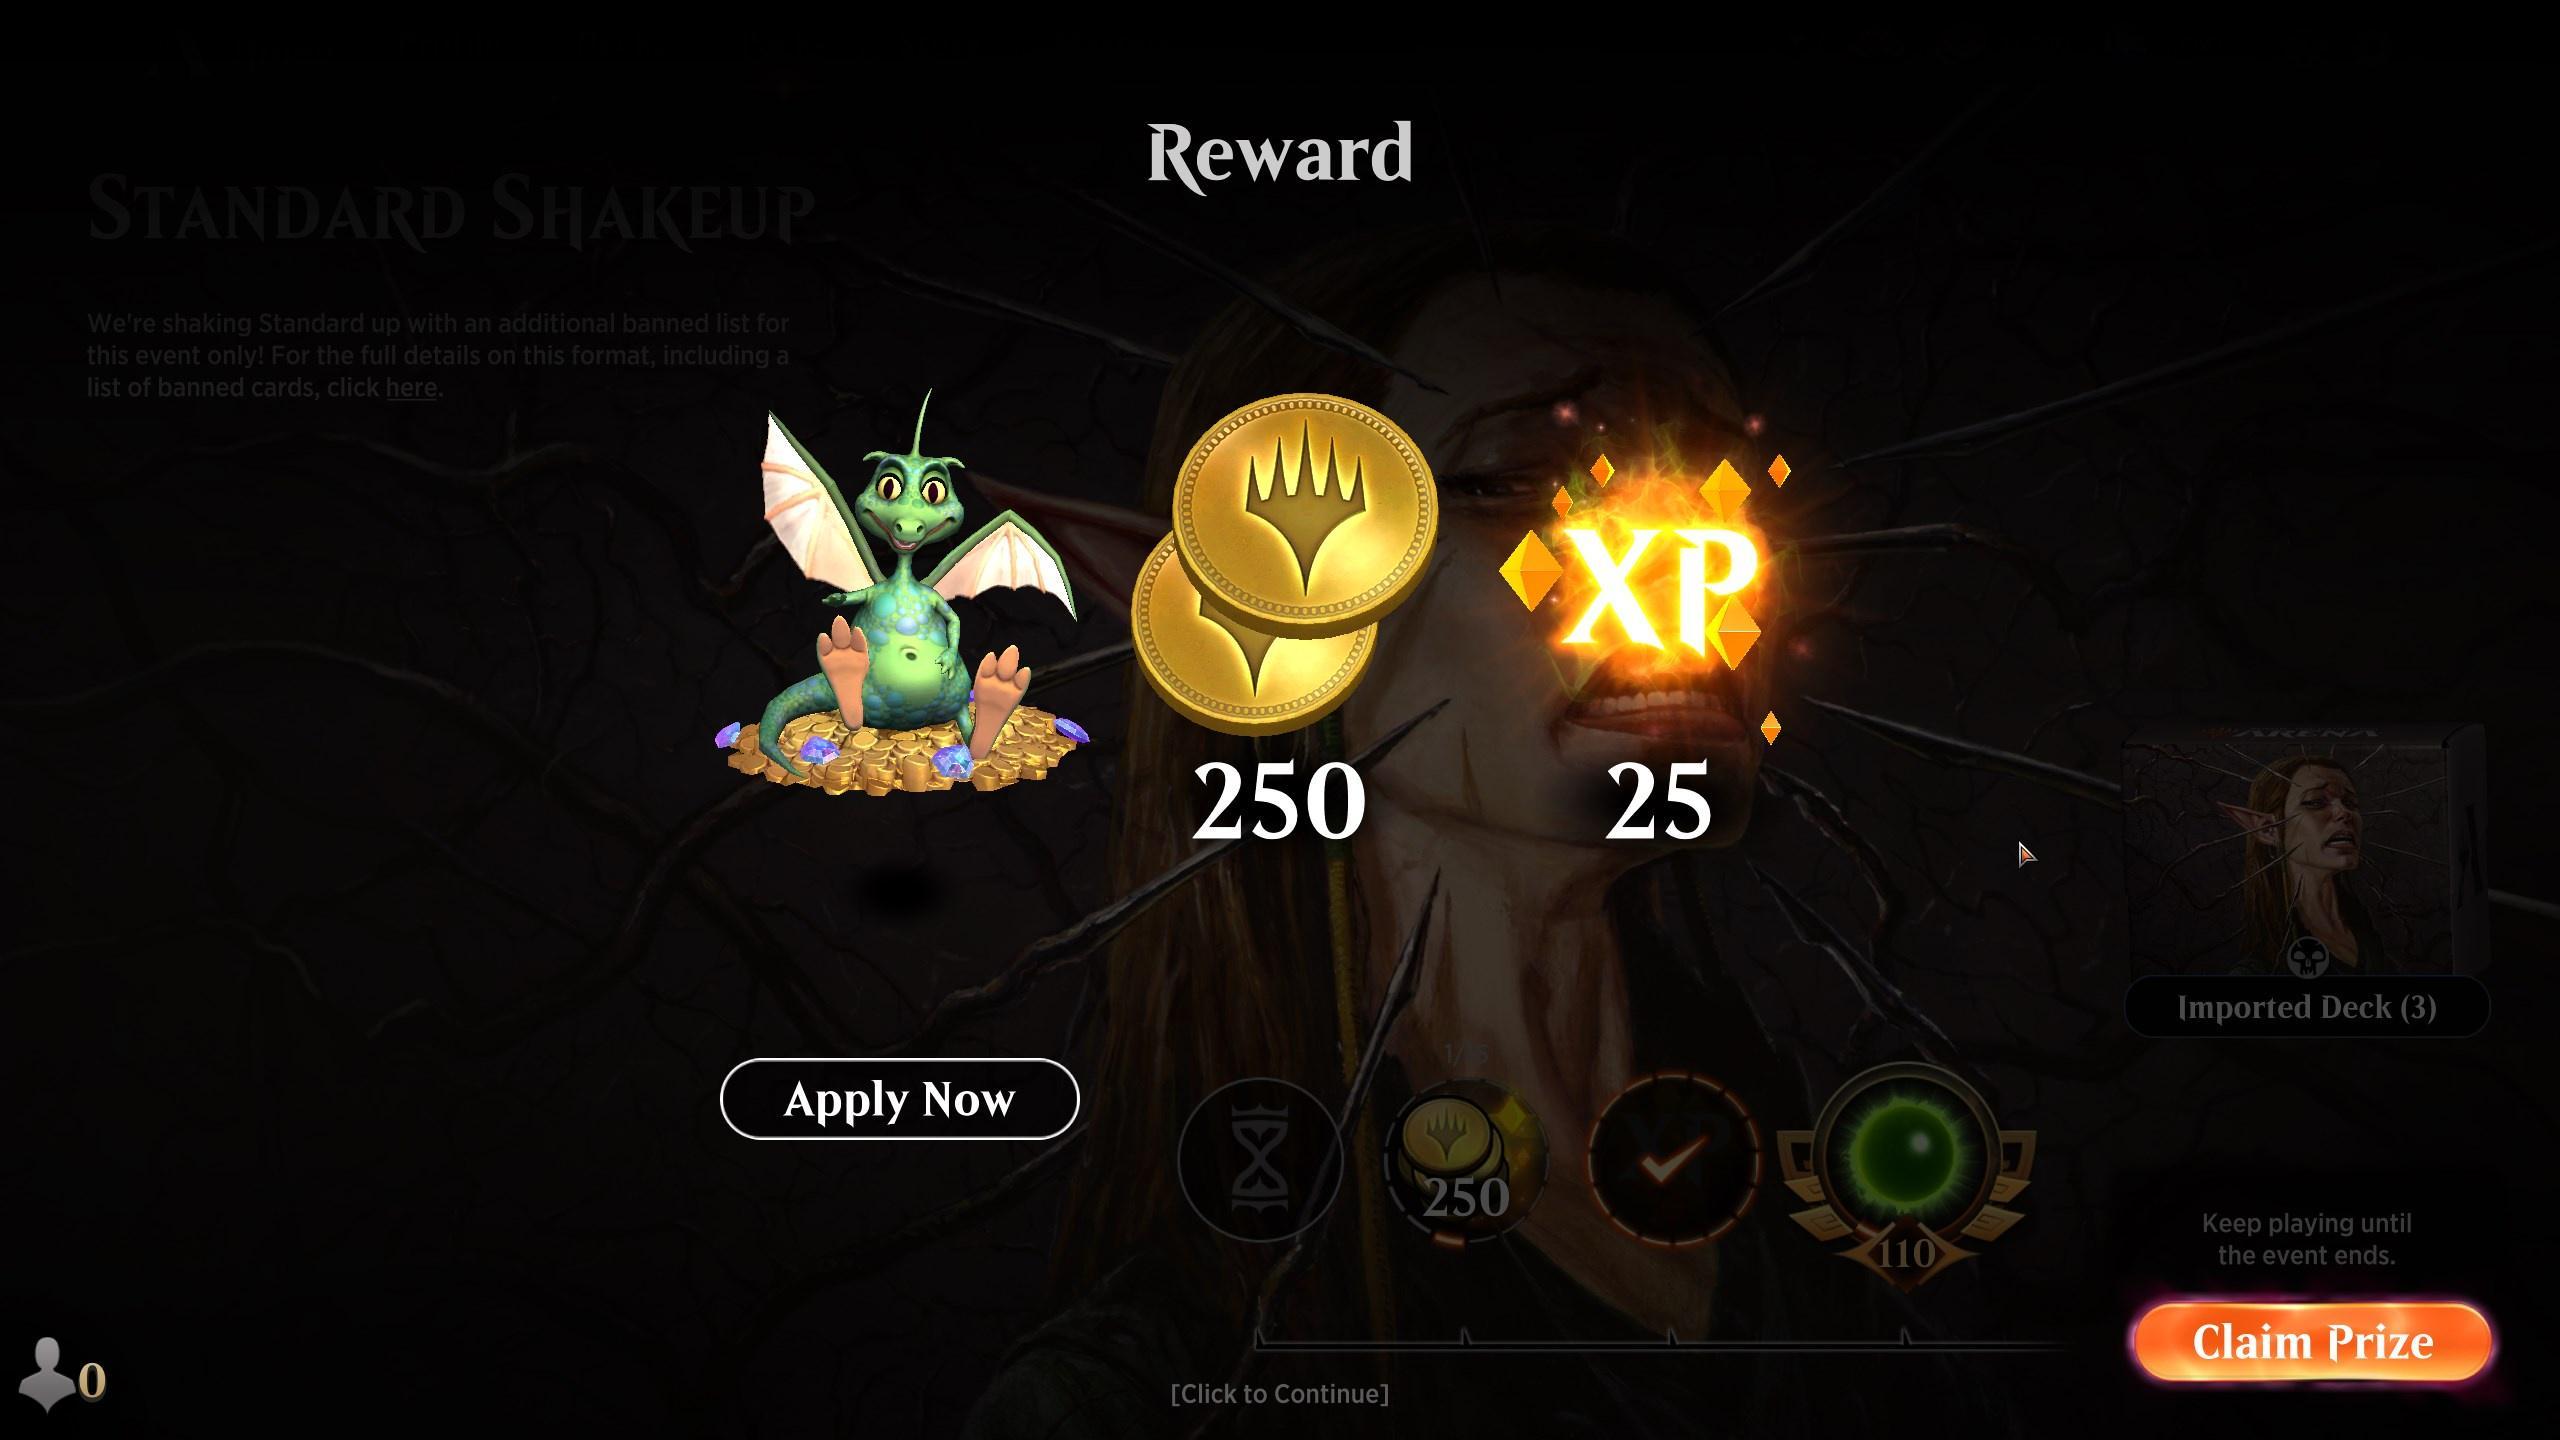 Standard Shakeup Event Reward